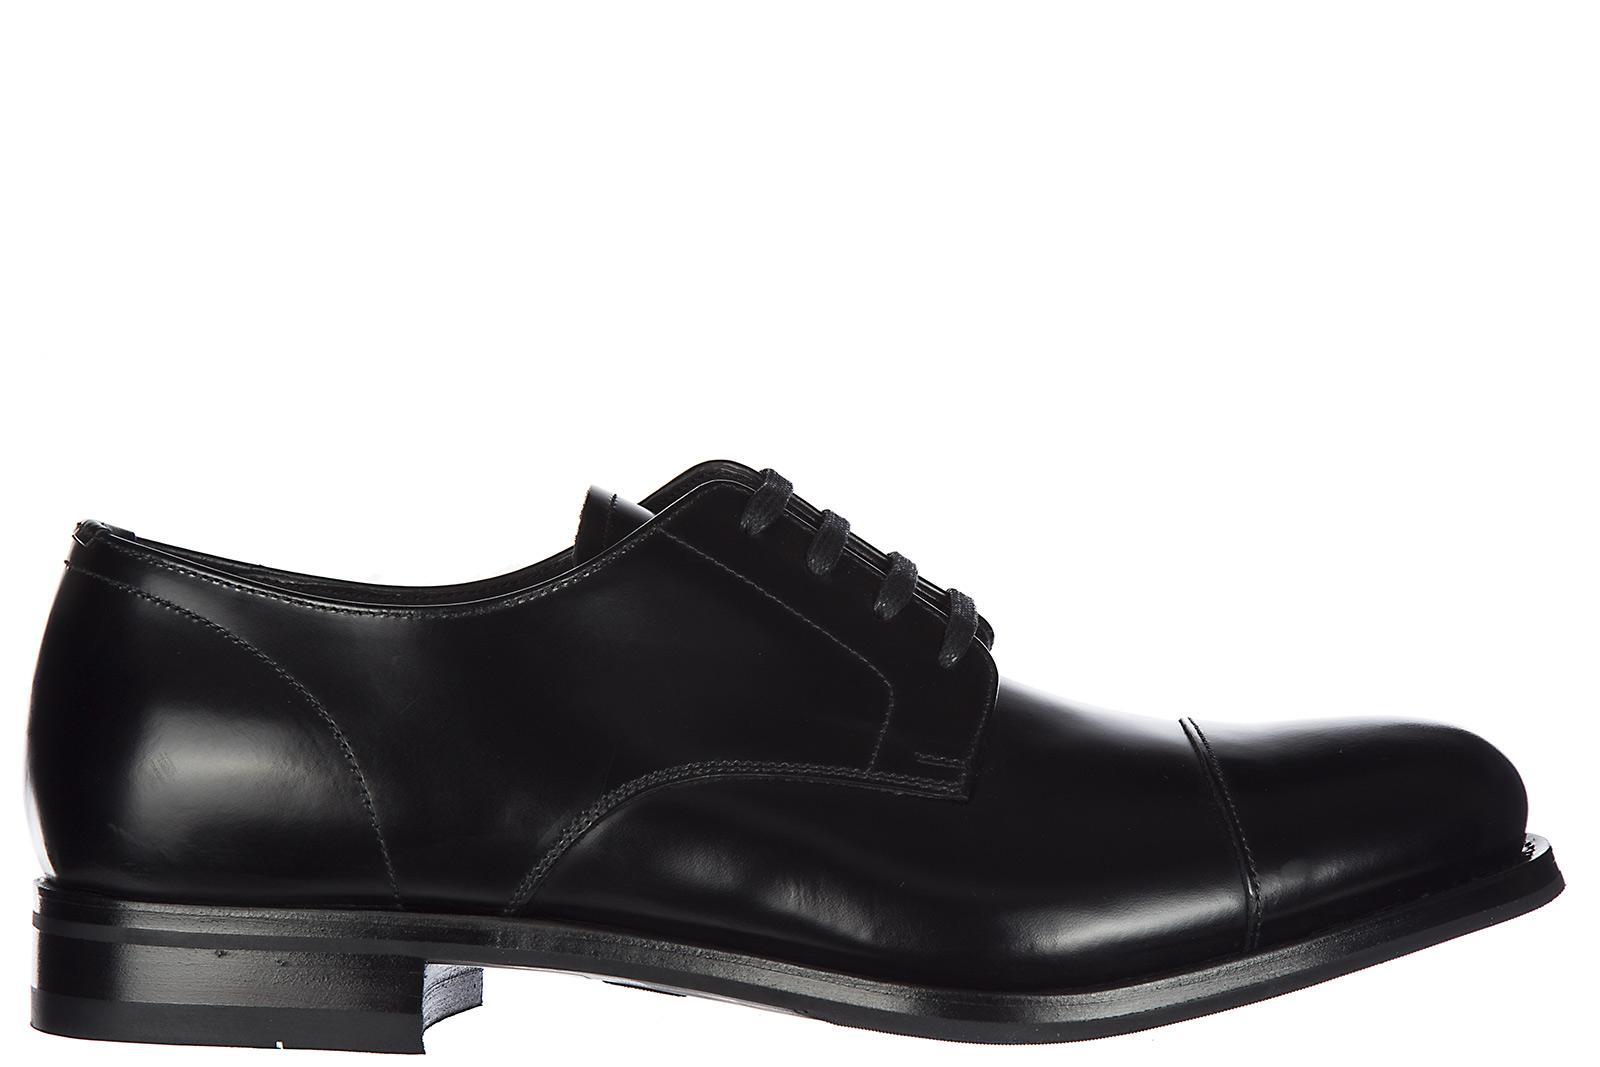 competitive price 22e6a 4bf38 Herrenschuhe Leder Herren Business Schuhe Schnürschuhe Derby Rois in Black